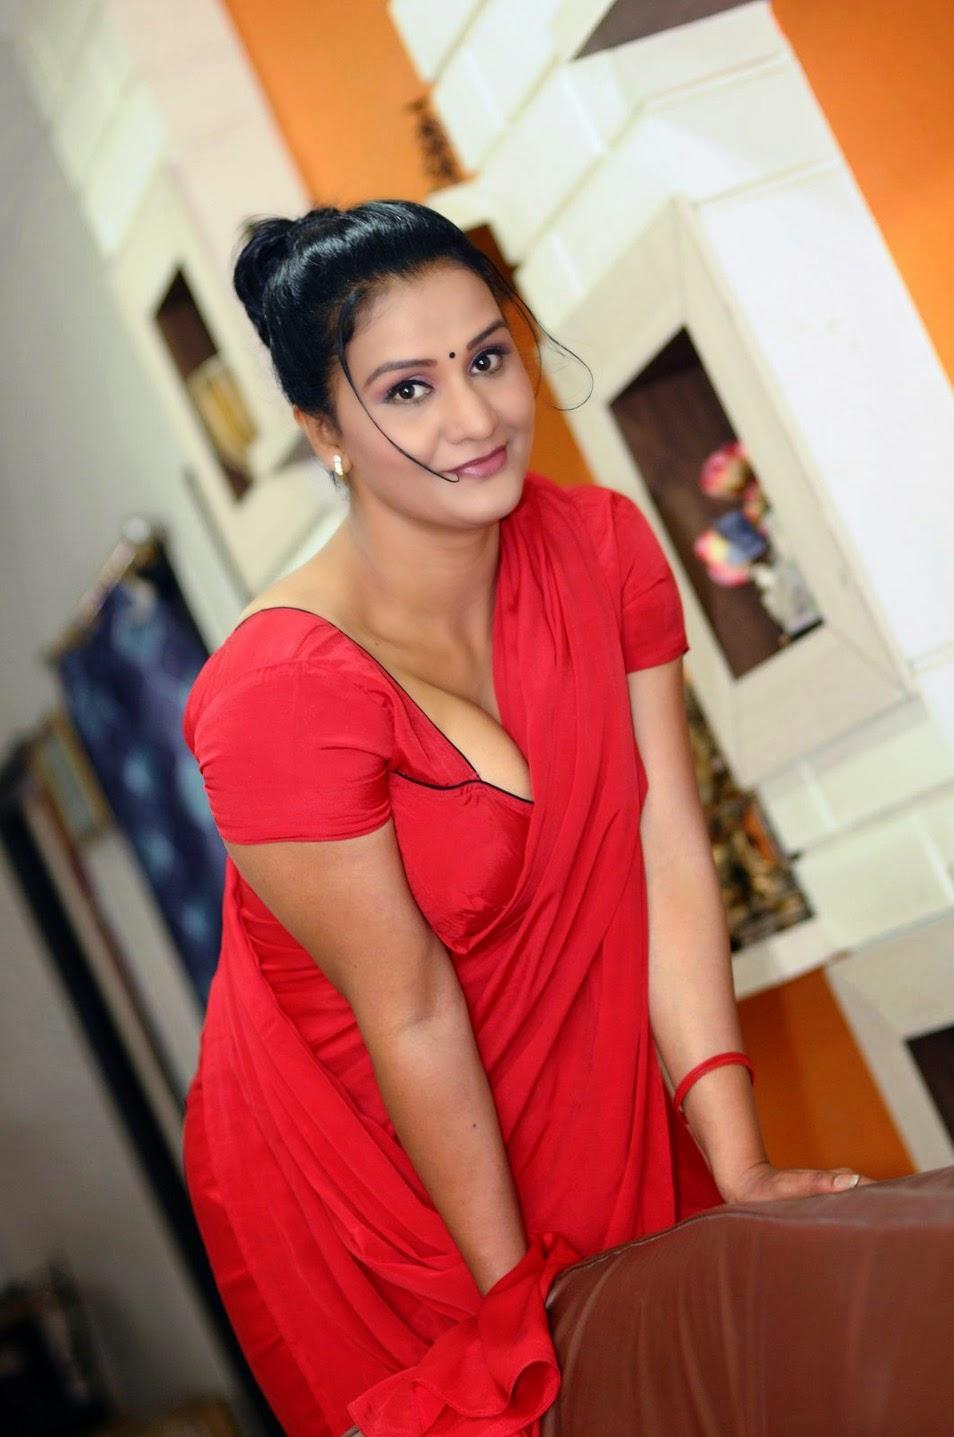 Hot Mallu Aunty Apoorva Huge Cleavage And Navel Show -3201